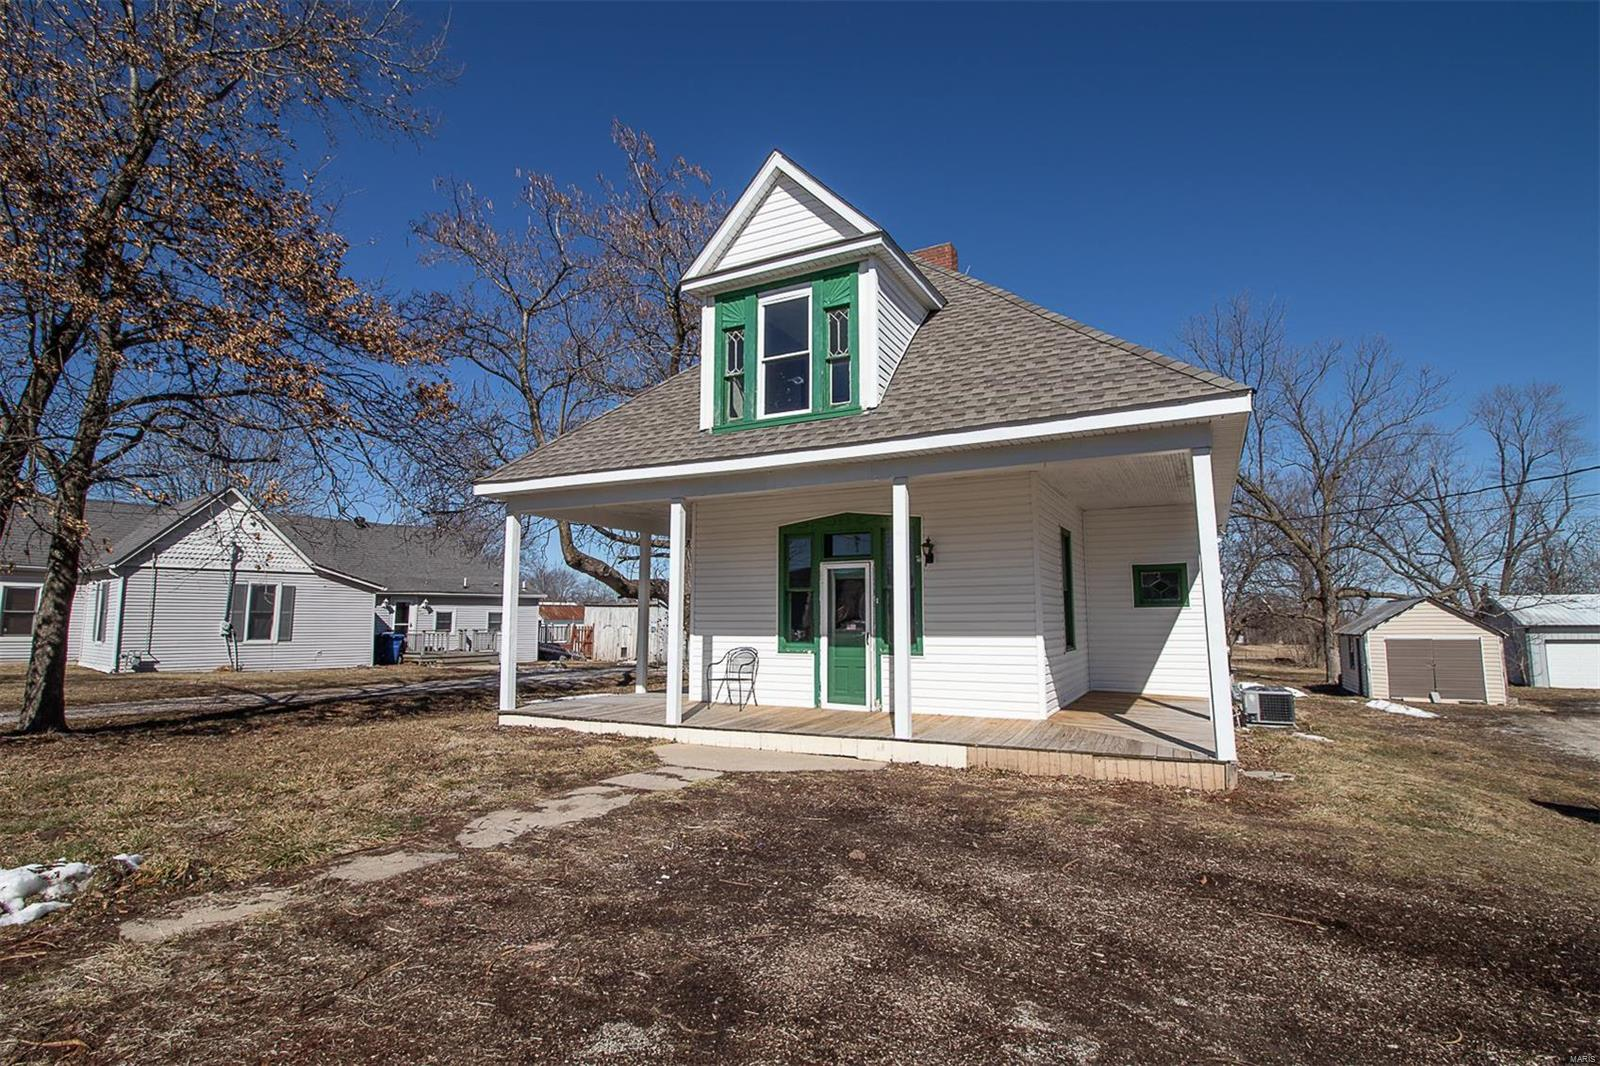 229 E Booneslick Property Photo - Jonesburg, MO real estate listing